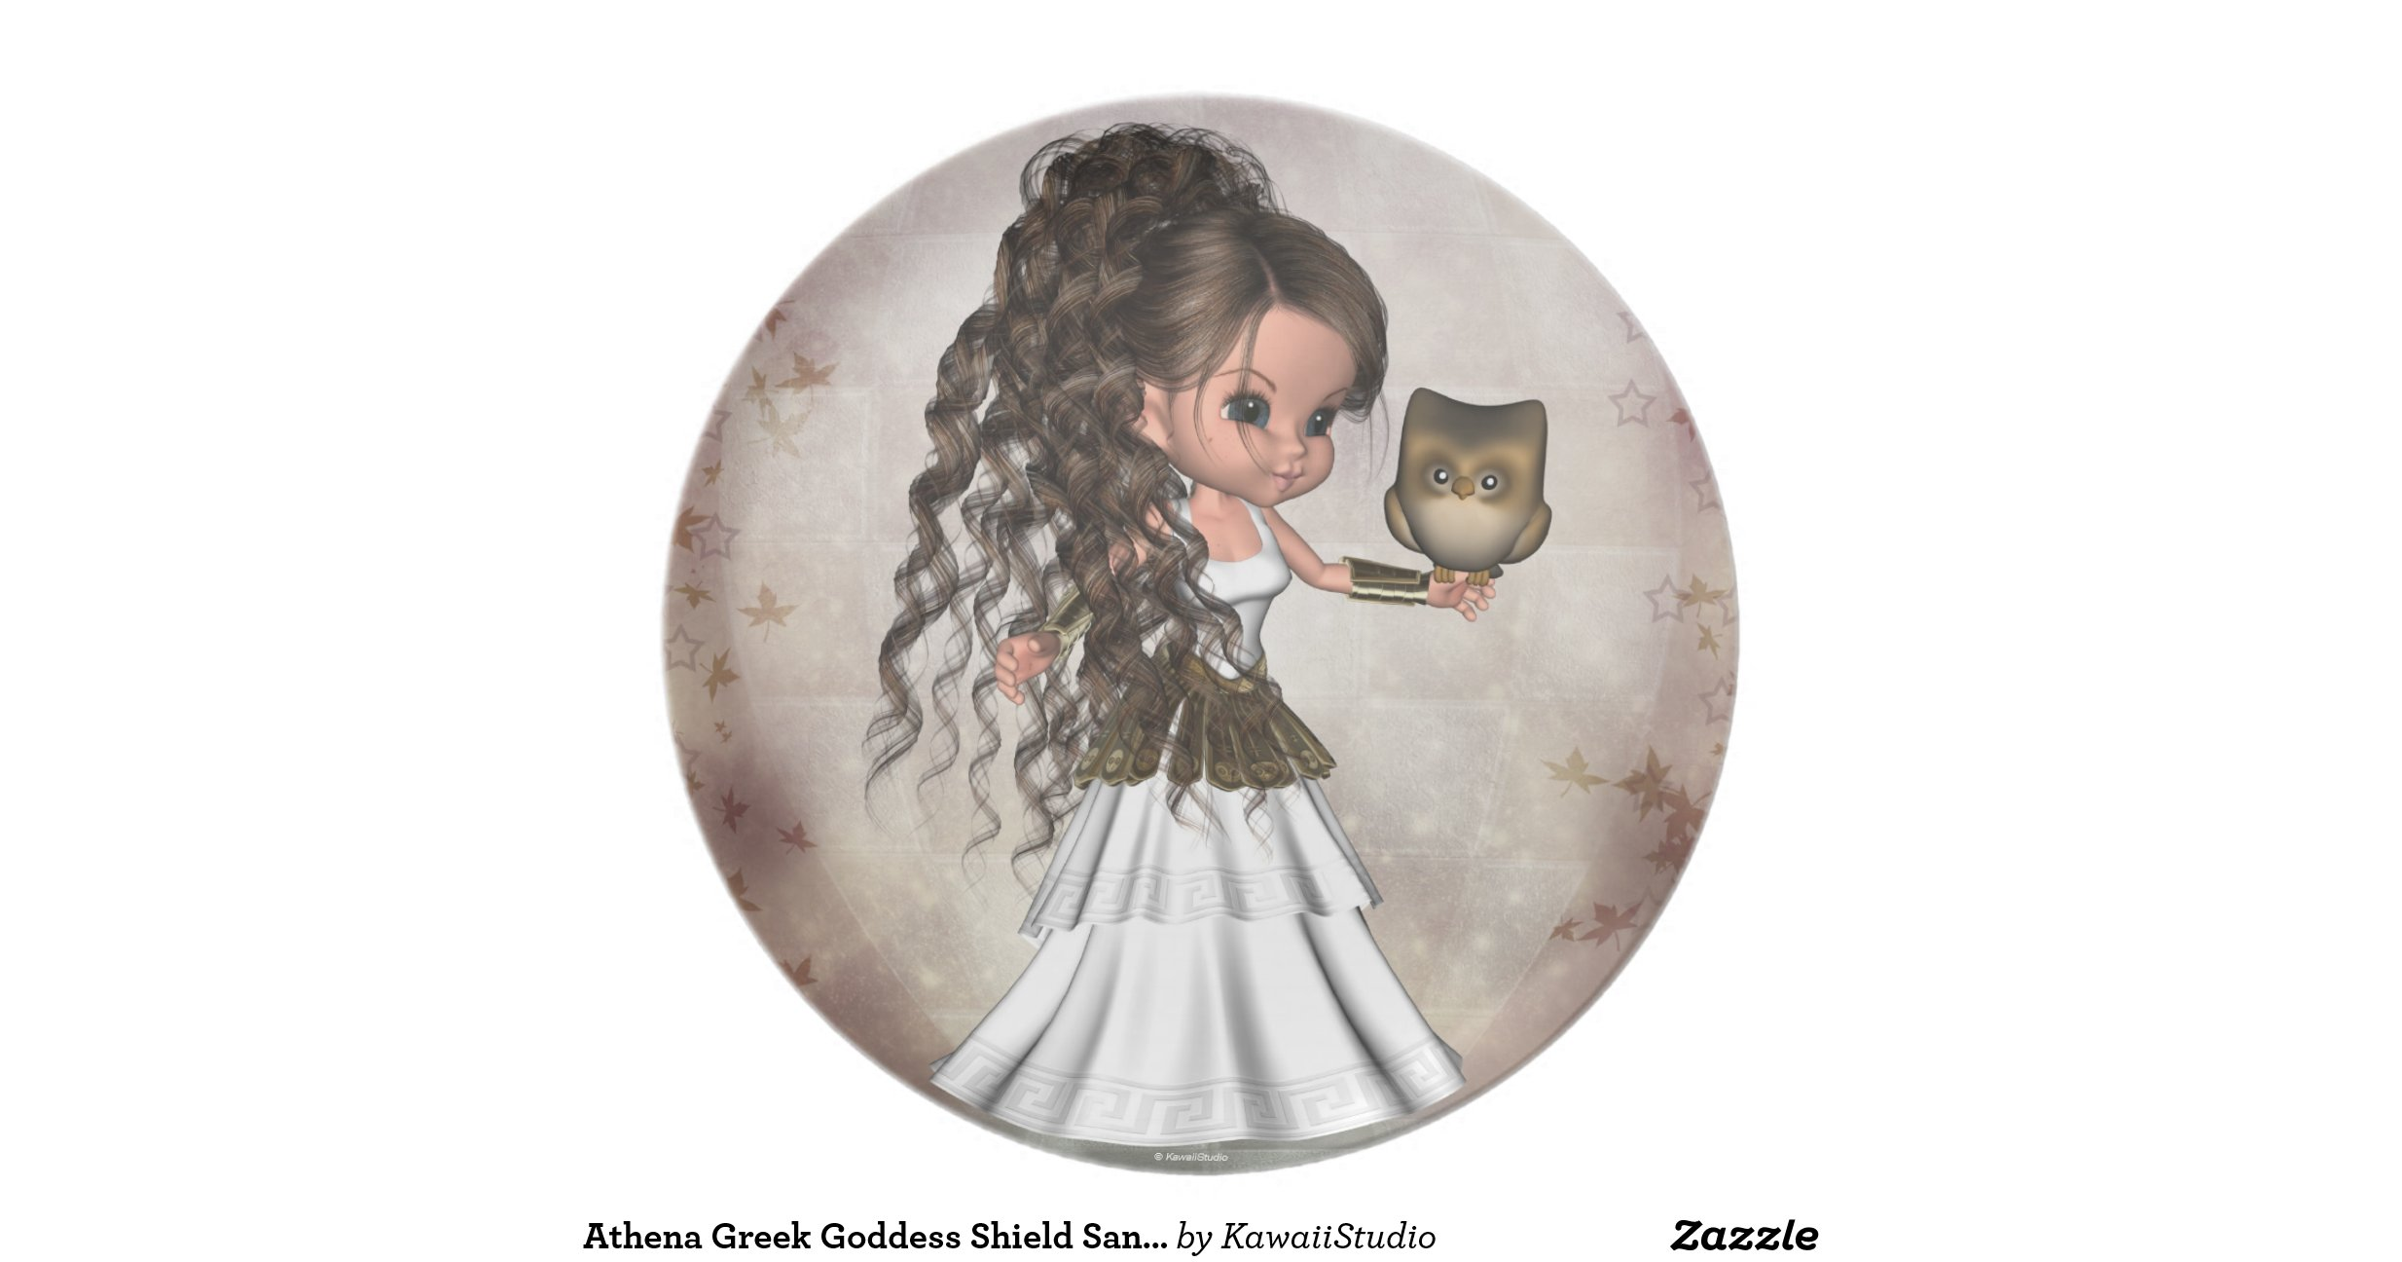 athena_greek_goddess_shield_sandles_plate ...